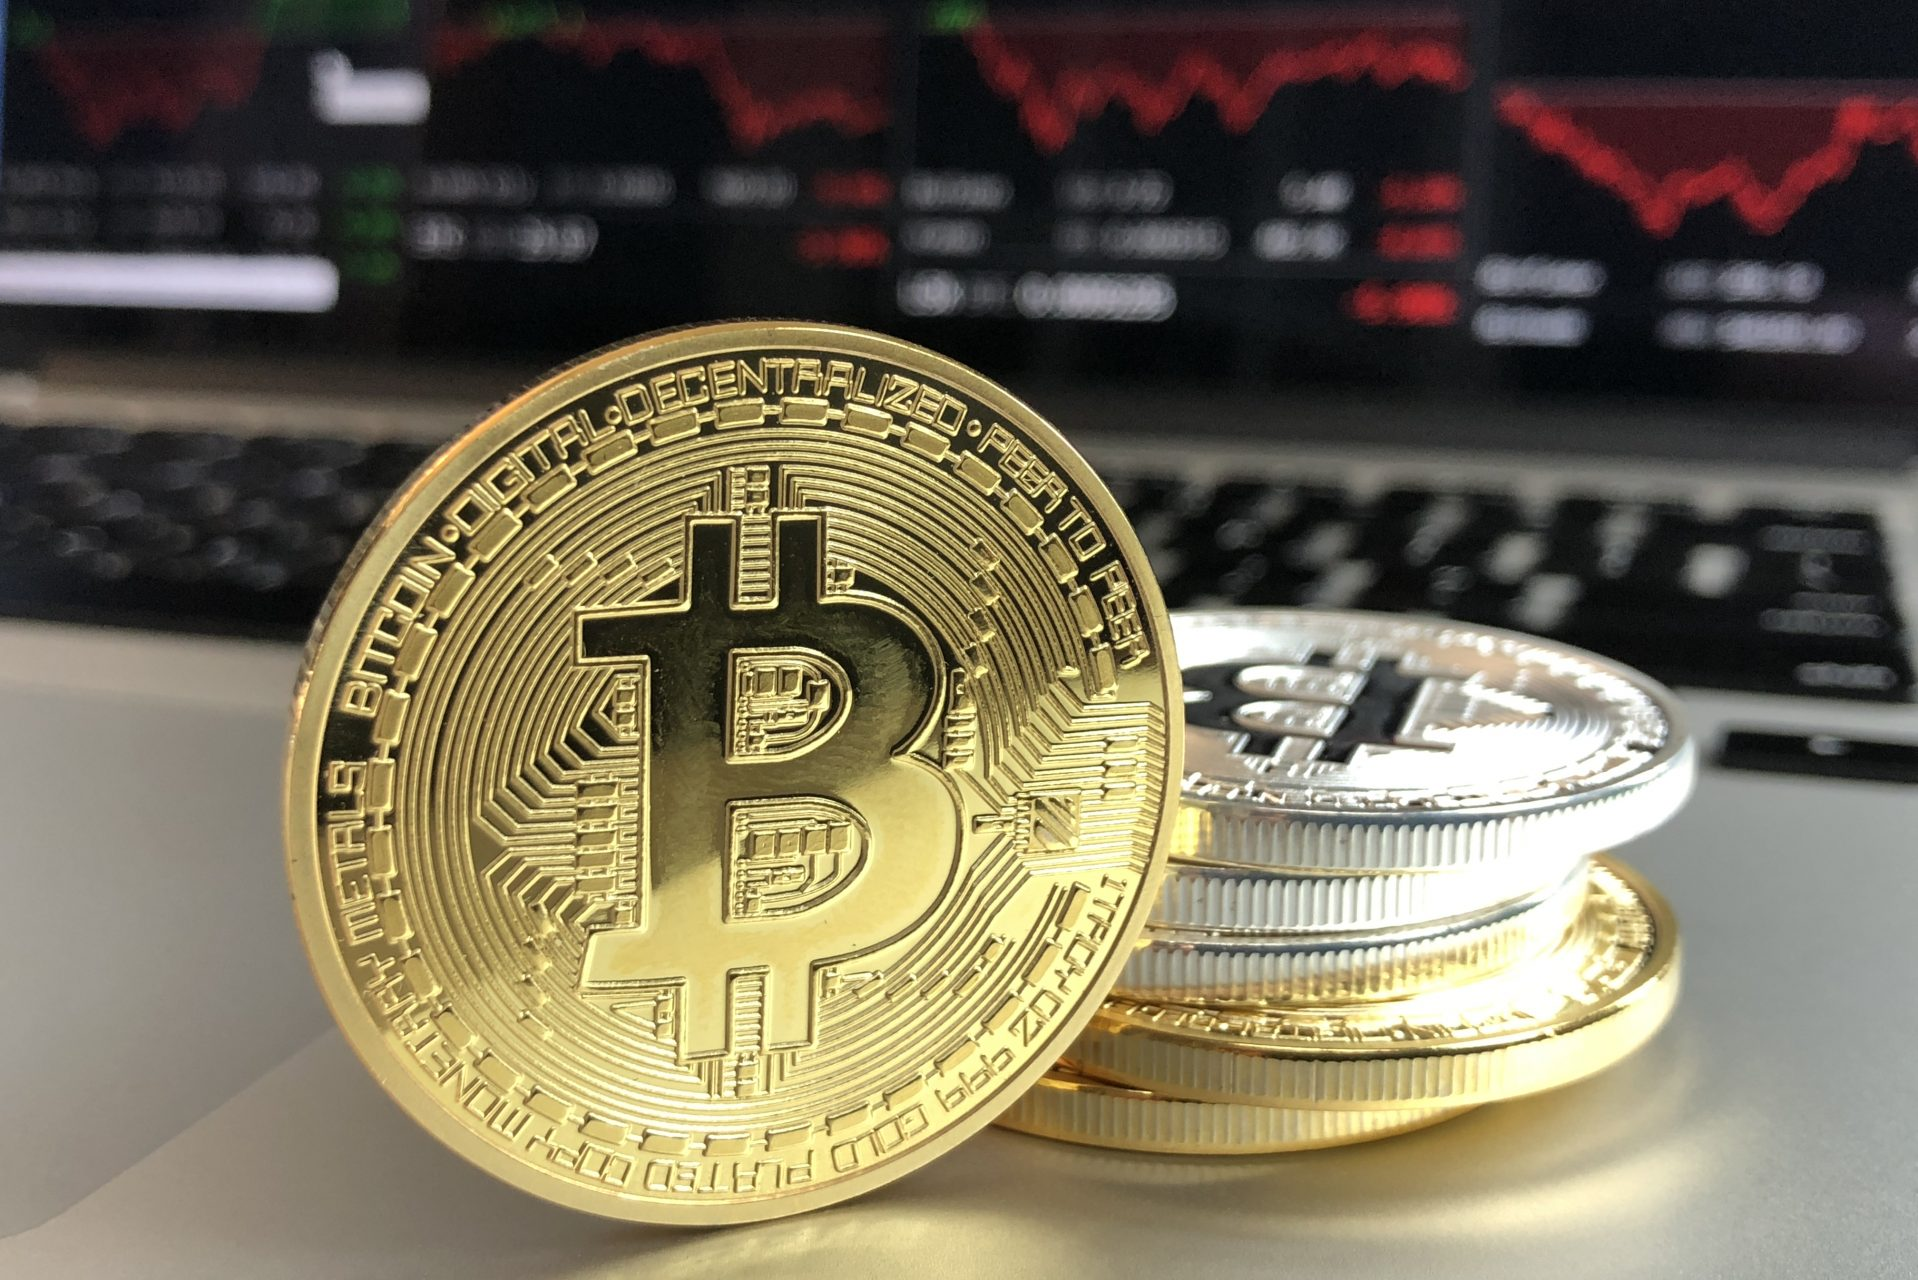 Bitcoin needs regulation